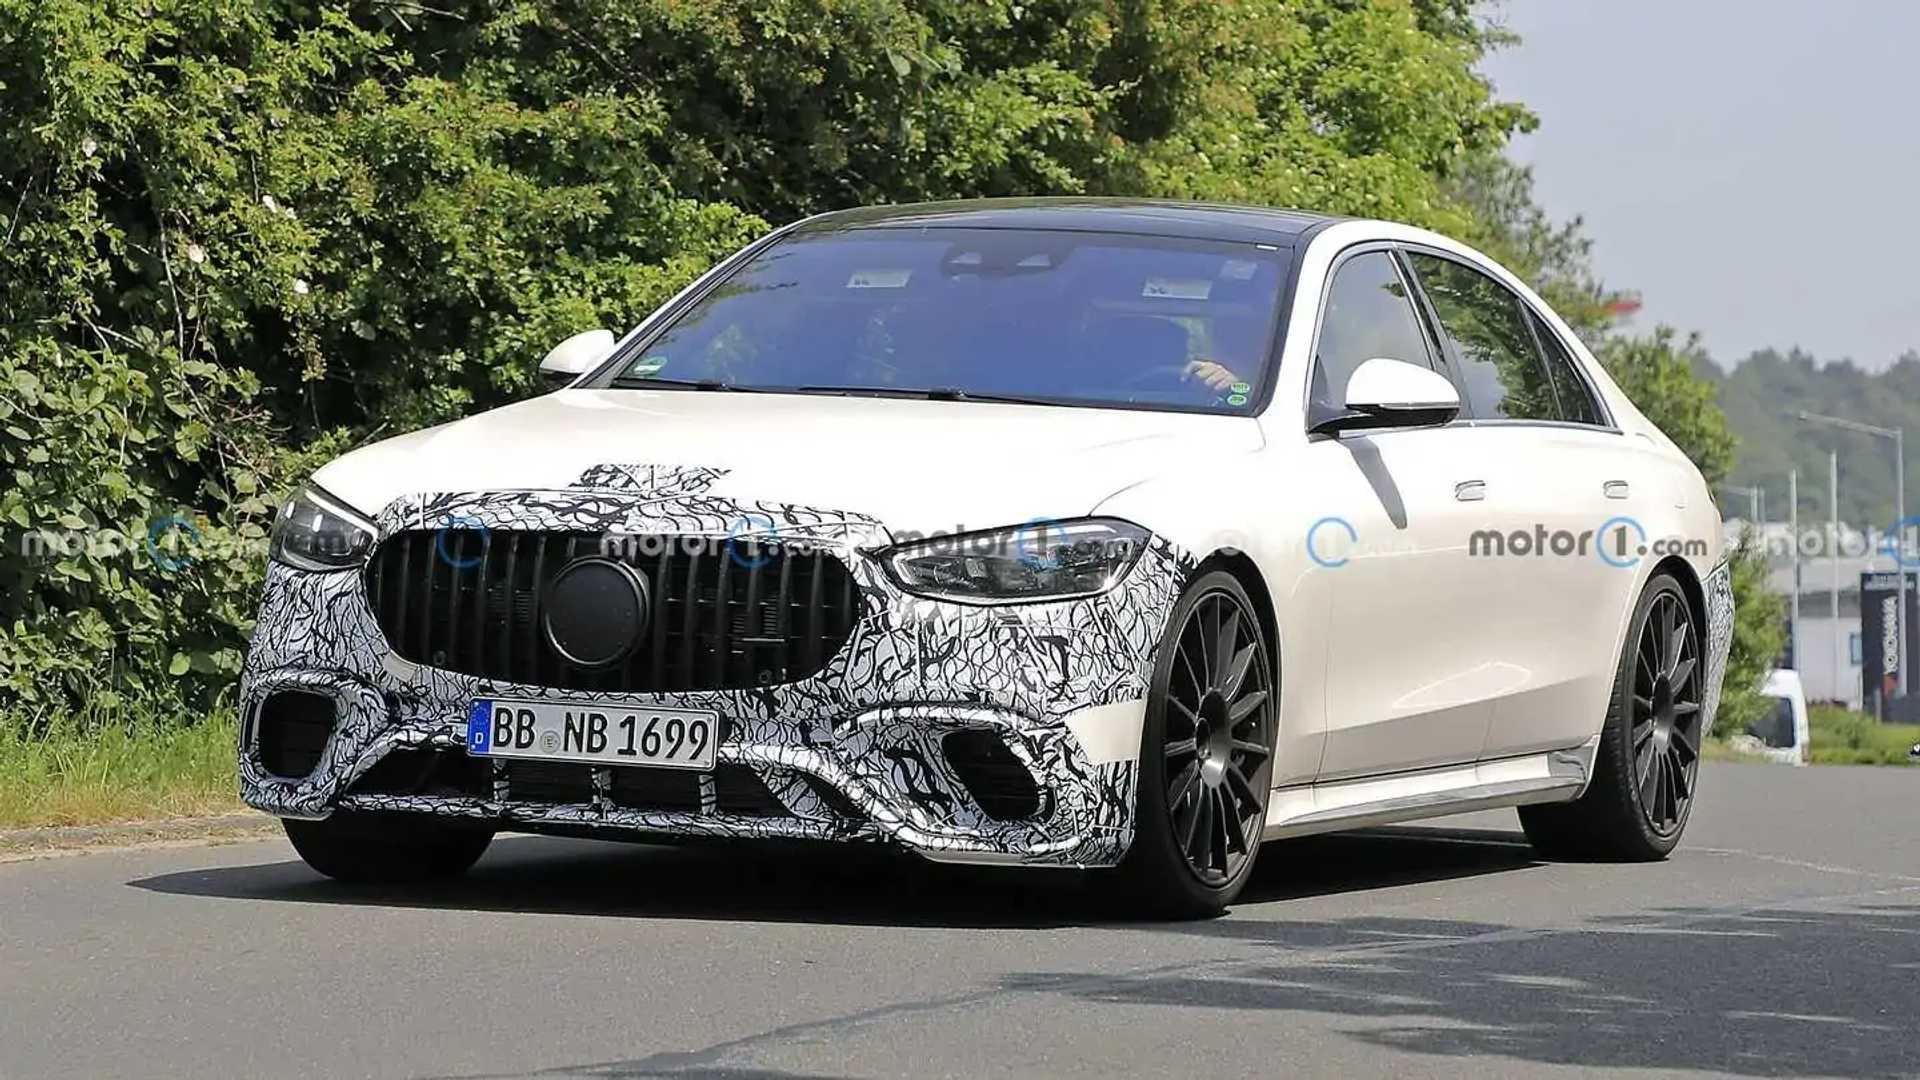 El Mercedes-AMG S 63 e, híbrido enchufable, está al caer